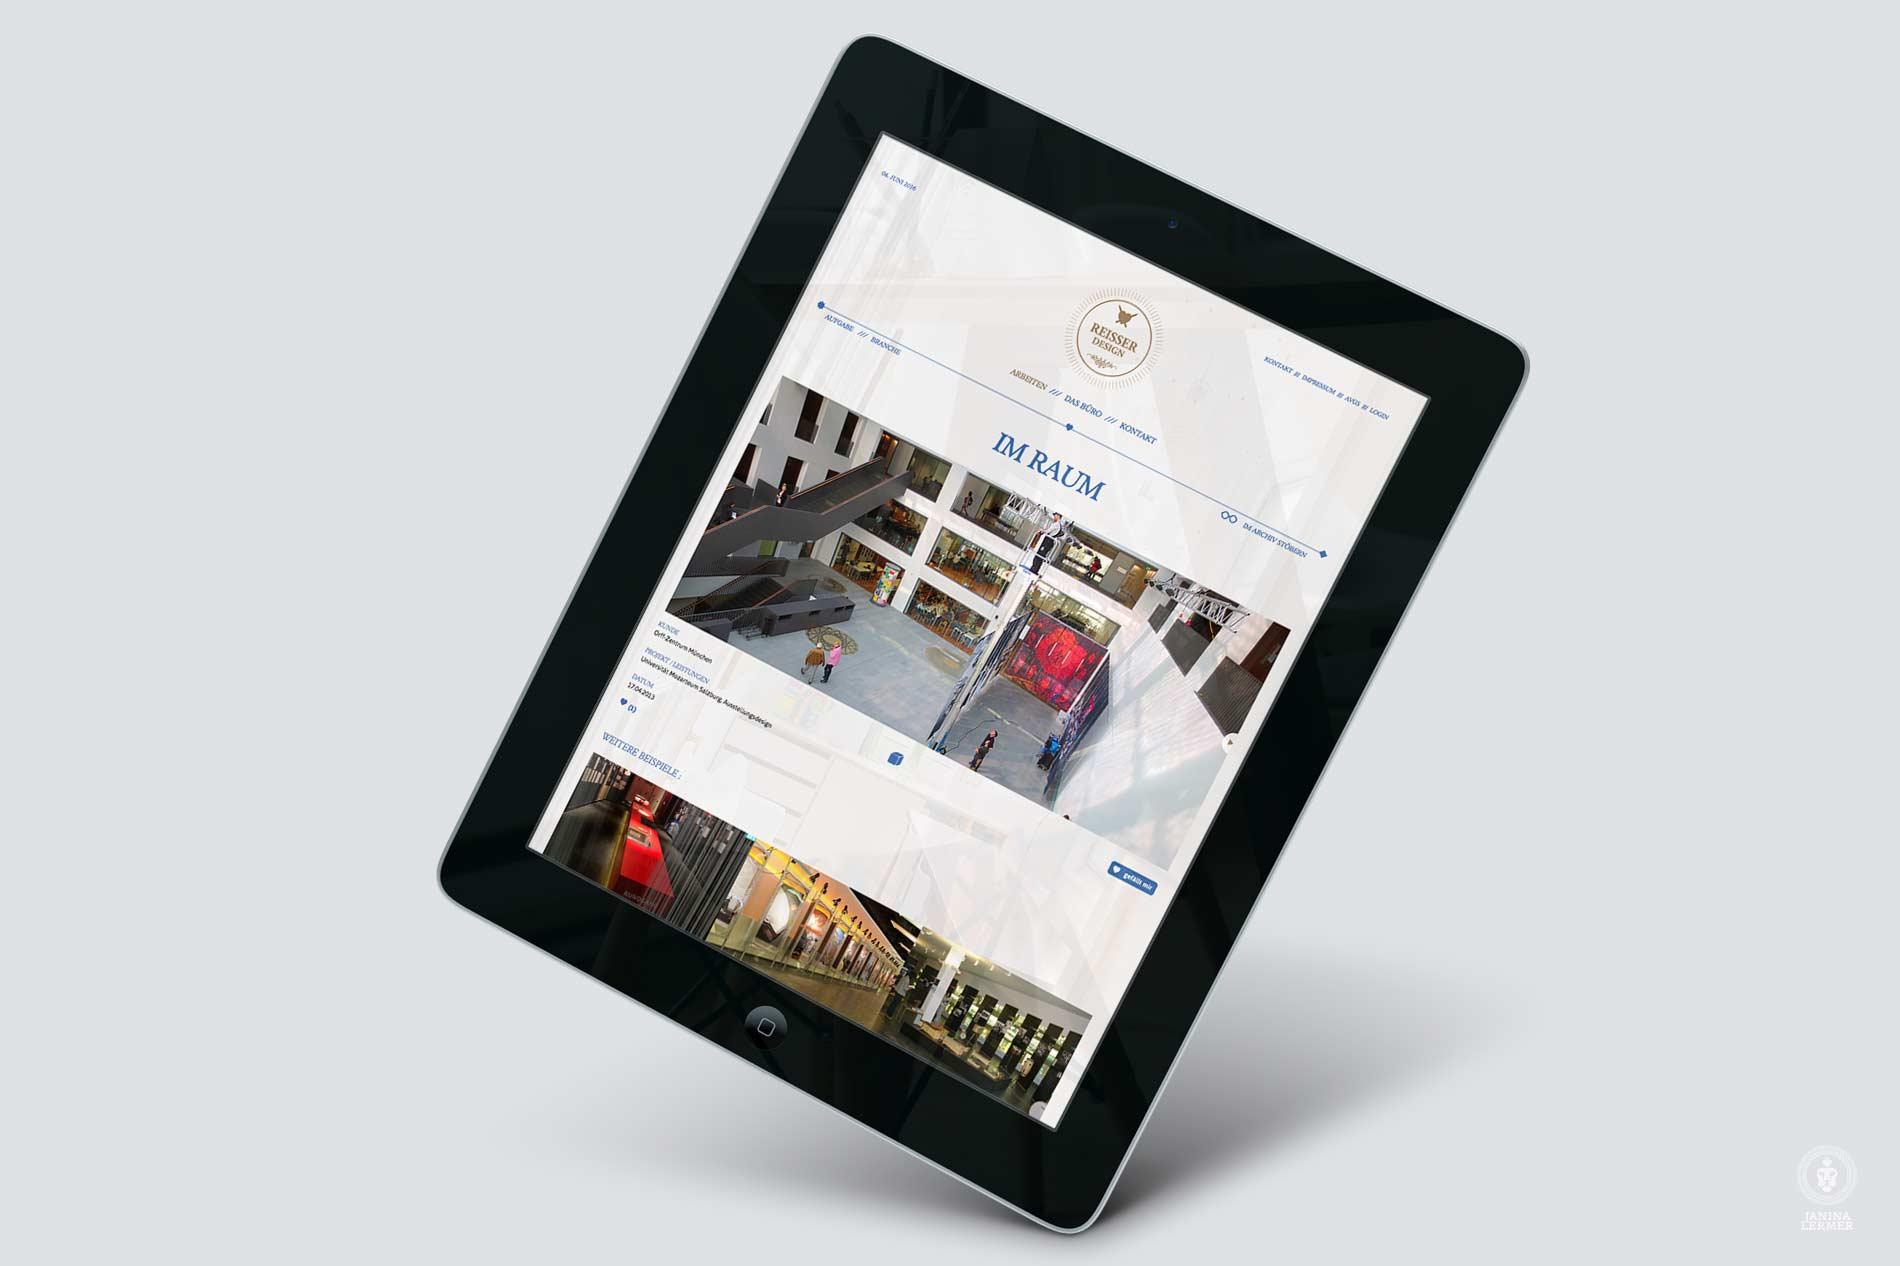 Janina-Lermer-Webseitenkonzept-Webseitengestaltung-Webdesign-Reisserdesign-Ipad-Projekte-imRaum-project-inRoom